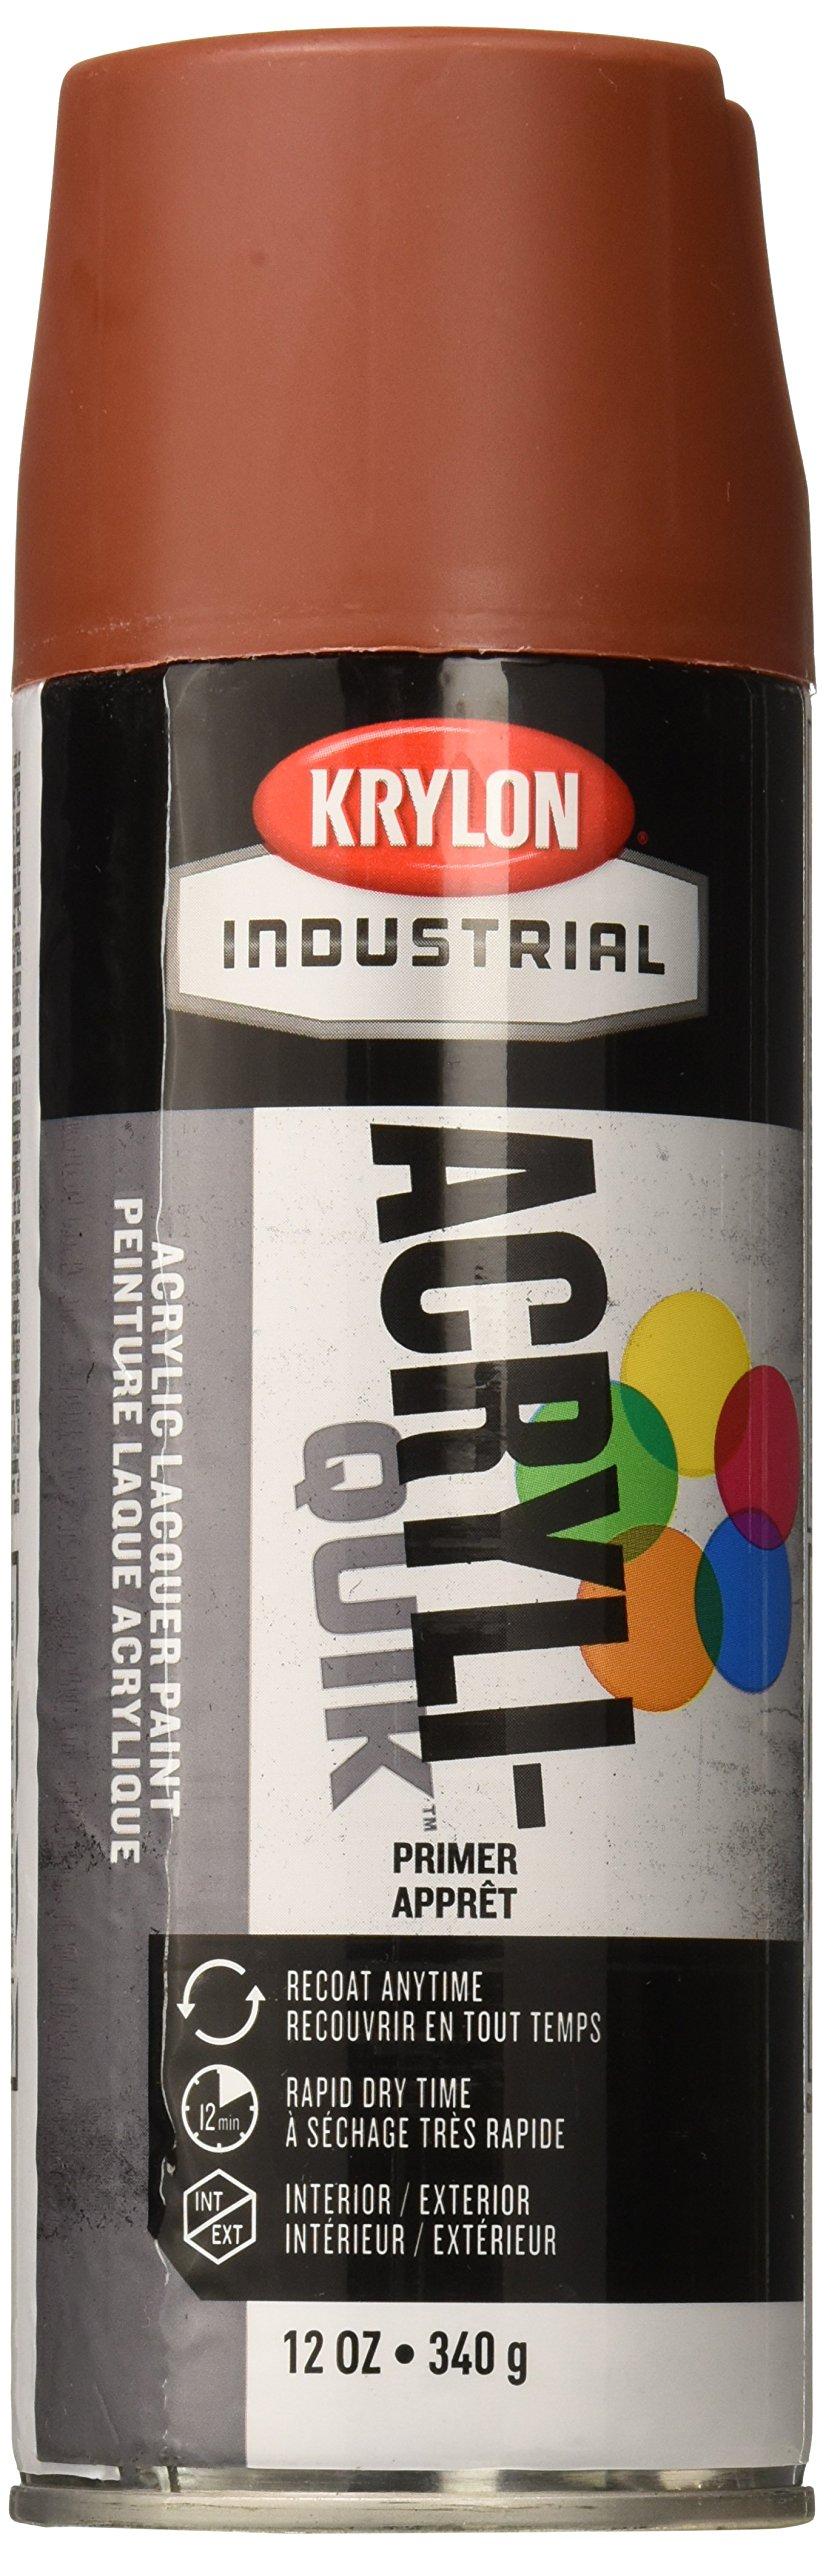 Krylon K01317A00 Primer Five Ball Industrial Spray Paint, 12 oz, Ruddy Brown (Pack of 6)